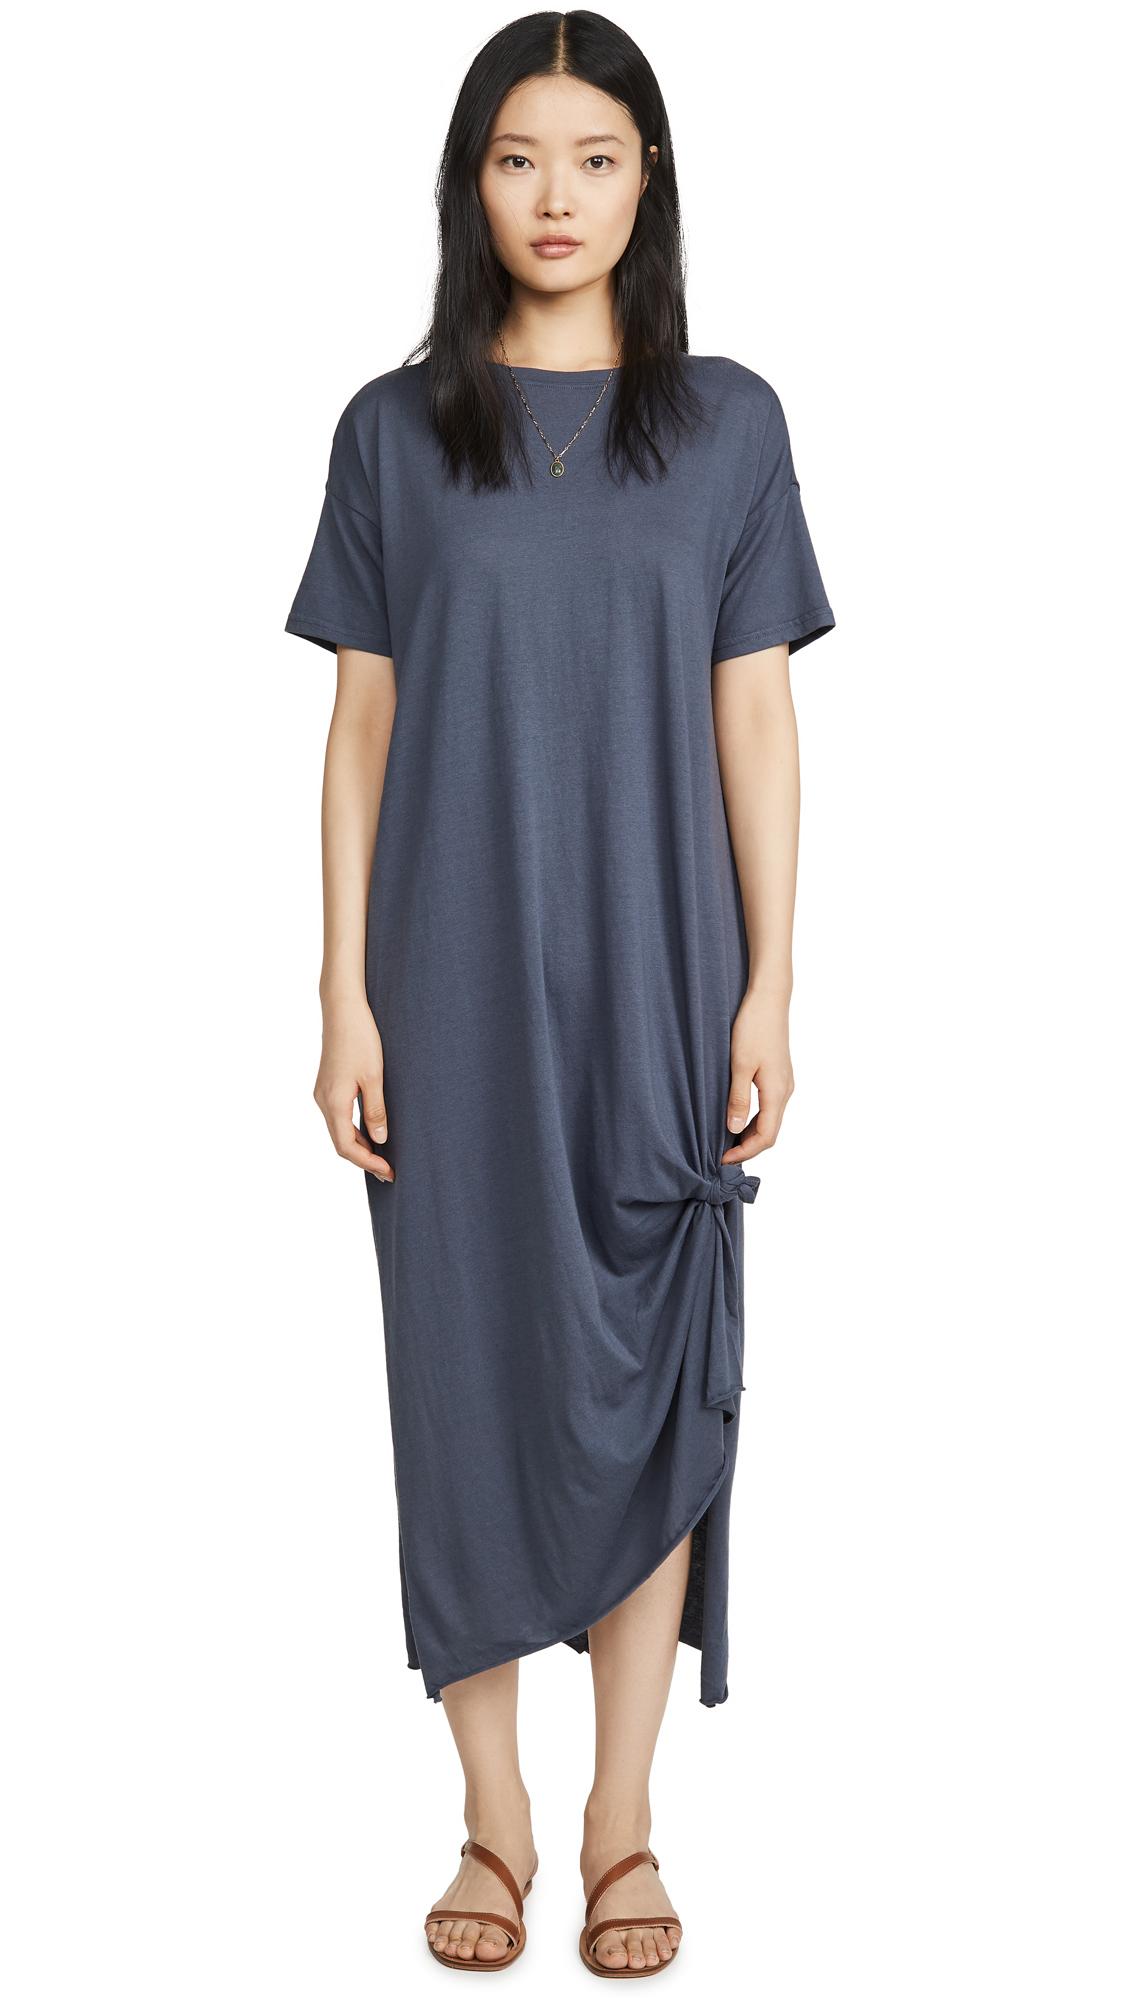 Buy Z Supply Side Slit Knot Dress online beautiful Z Supply Clothing, Dresses